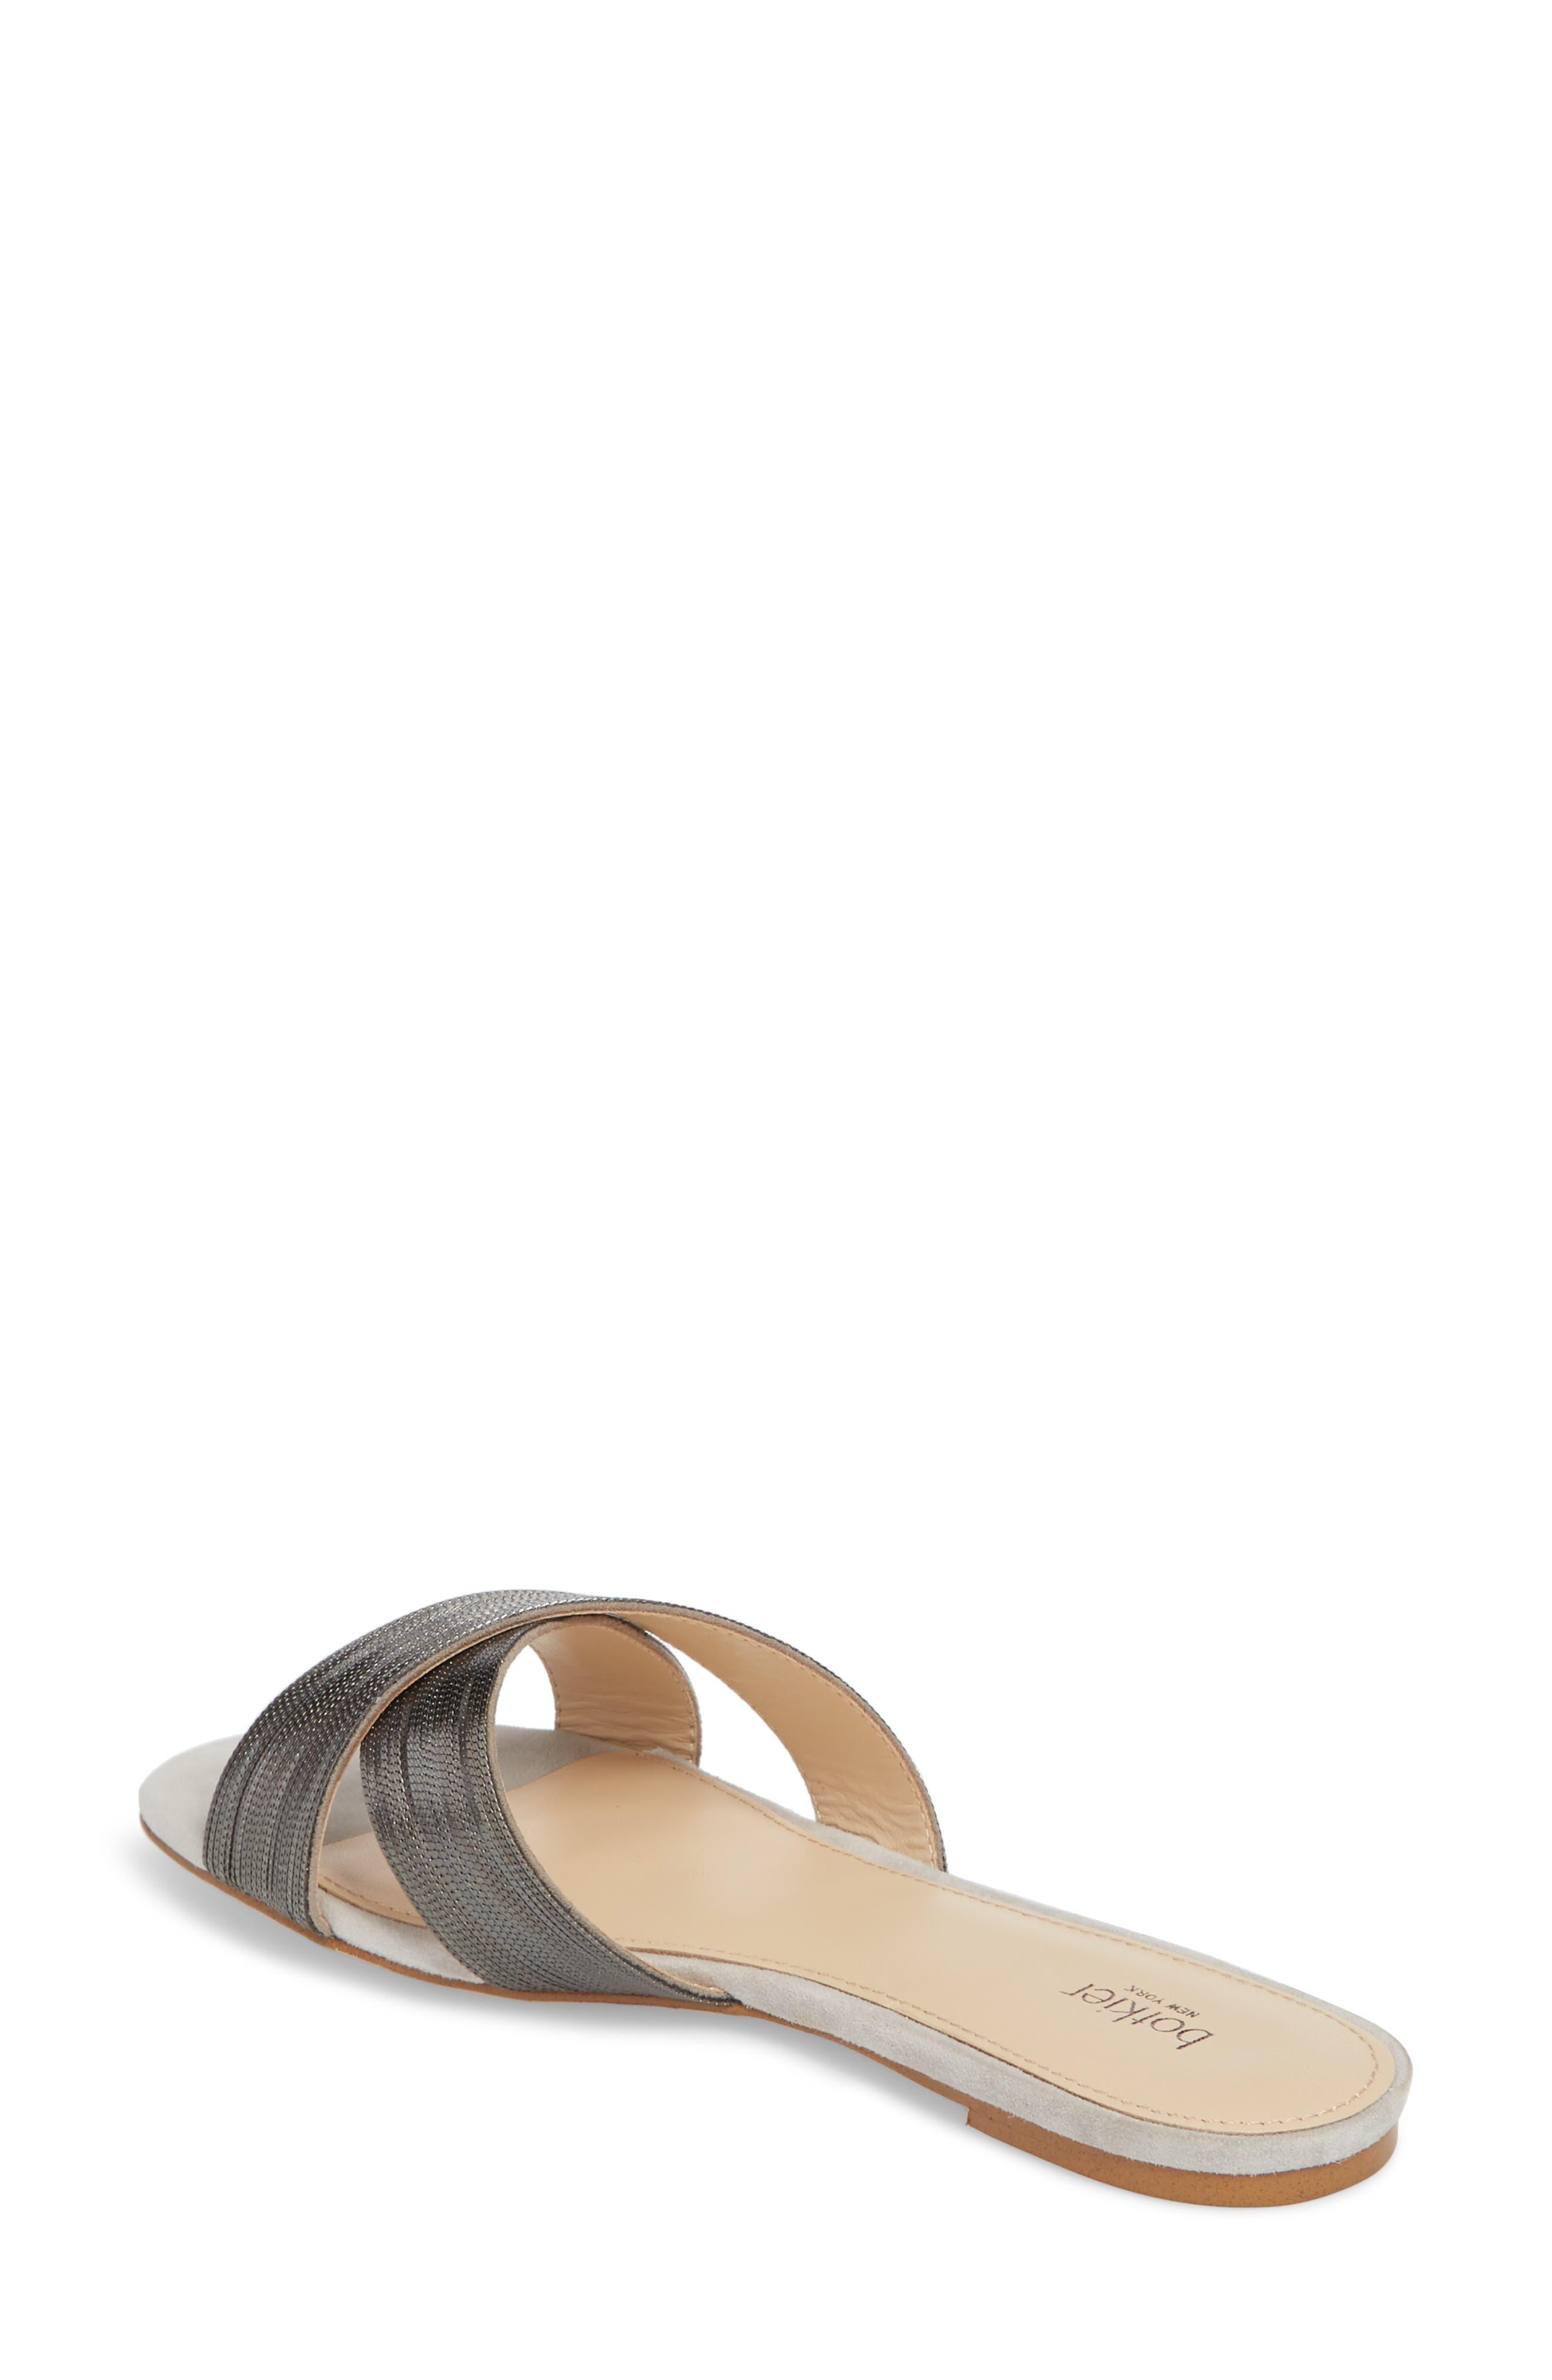 Millie Cross Strap Slide Sandal,                             Alternate thumbnail 2, color,                             CLAY/ GUNMETAL SUEDE